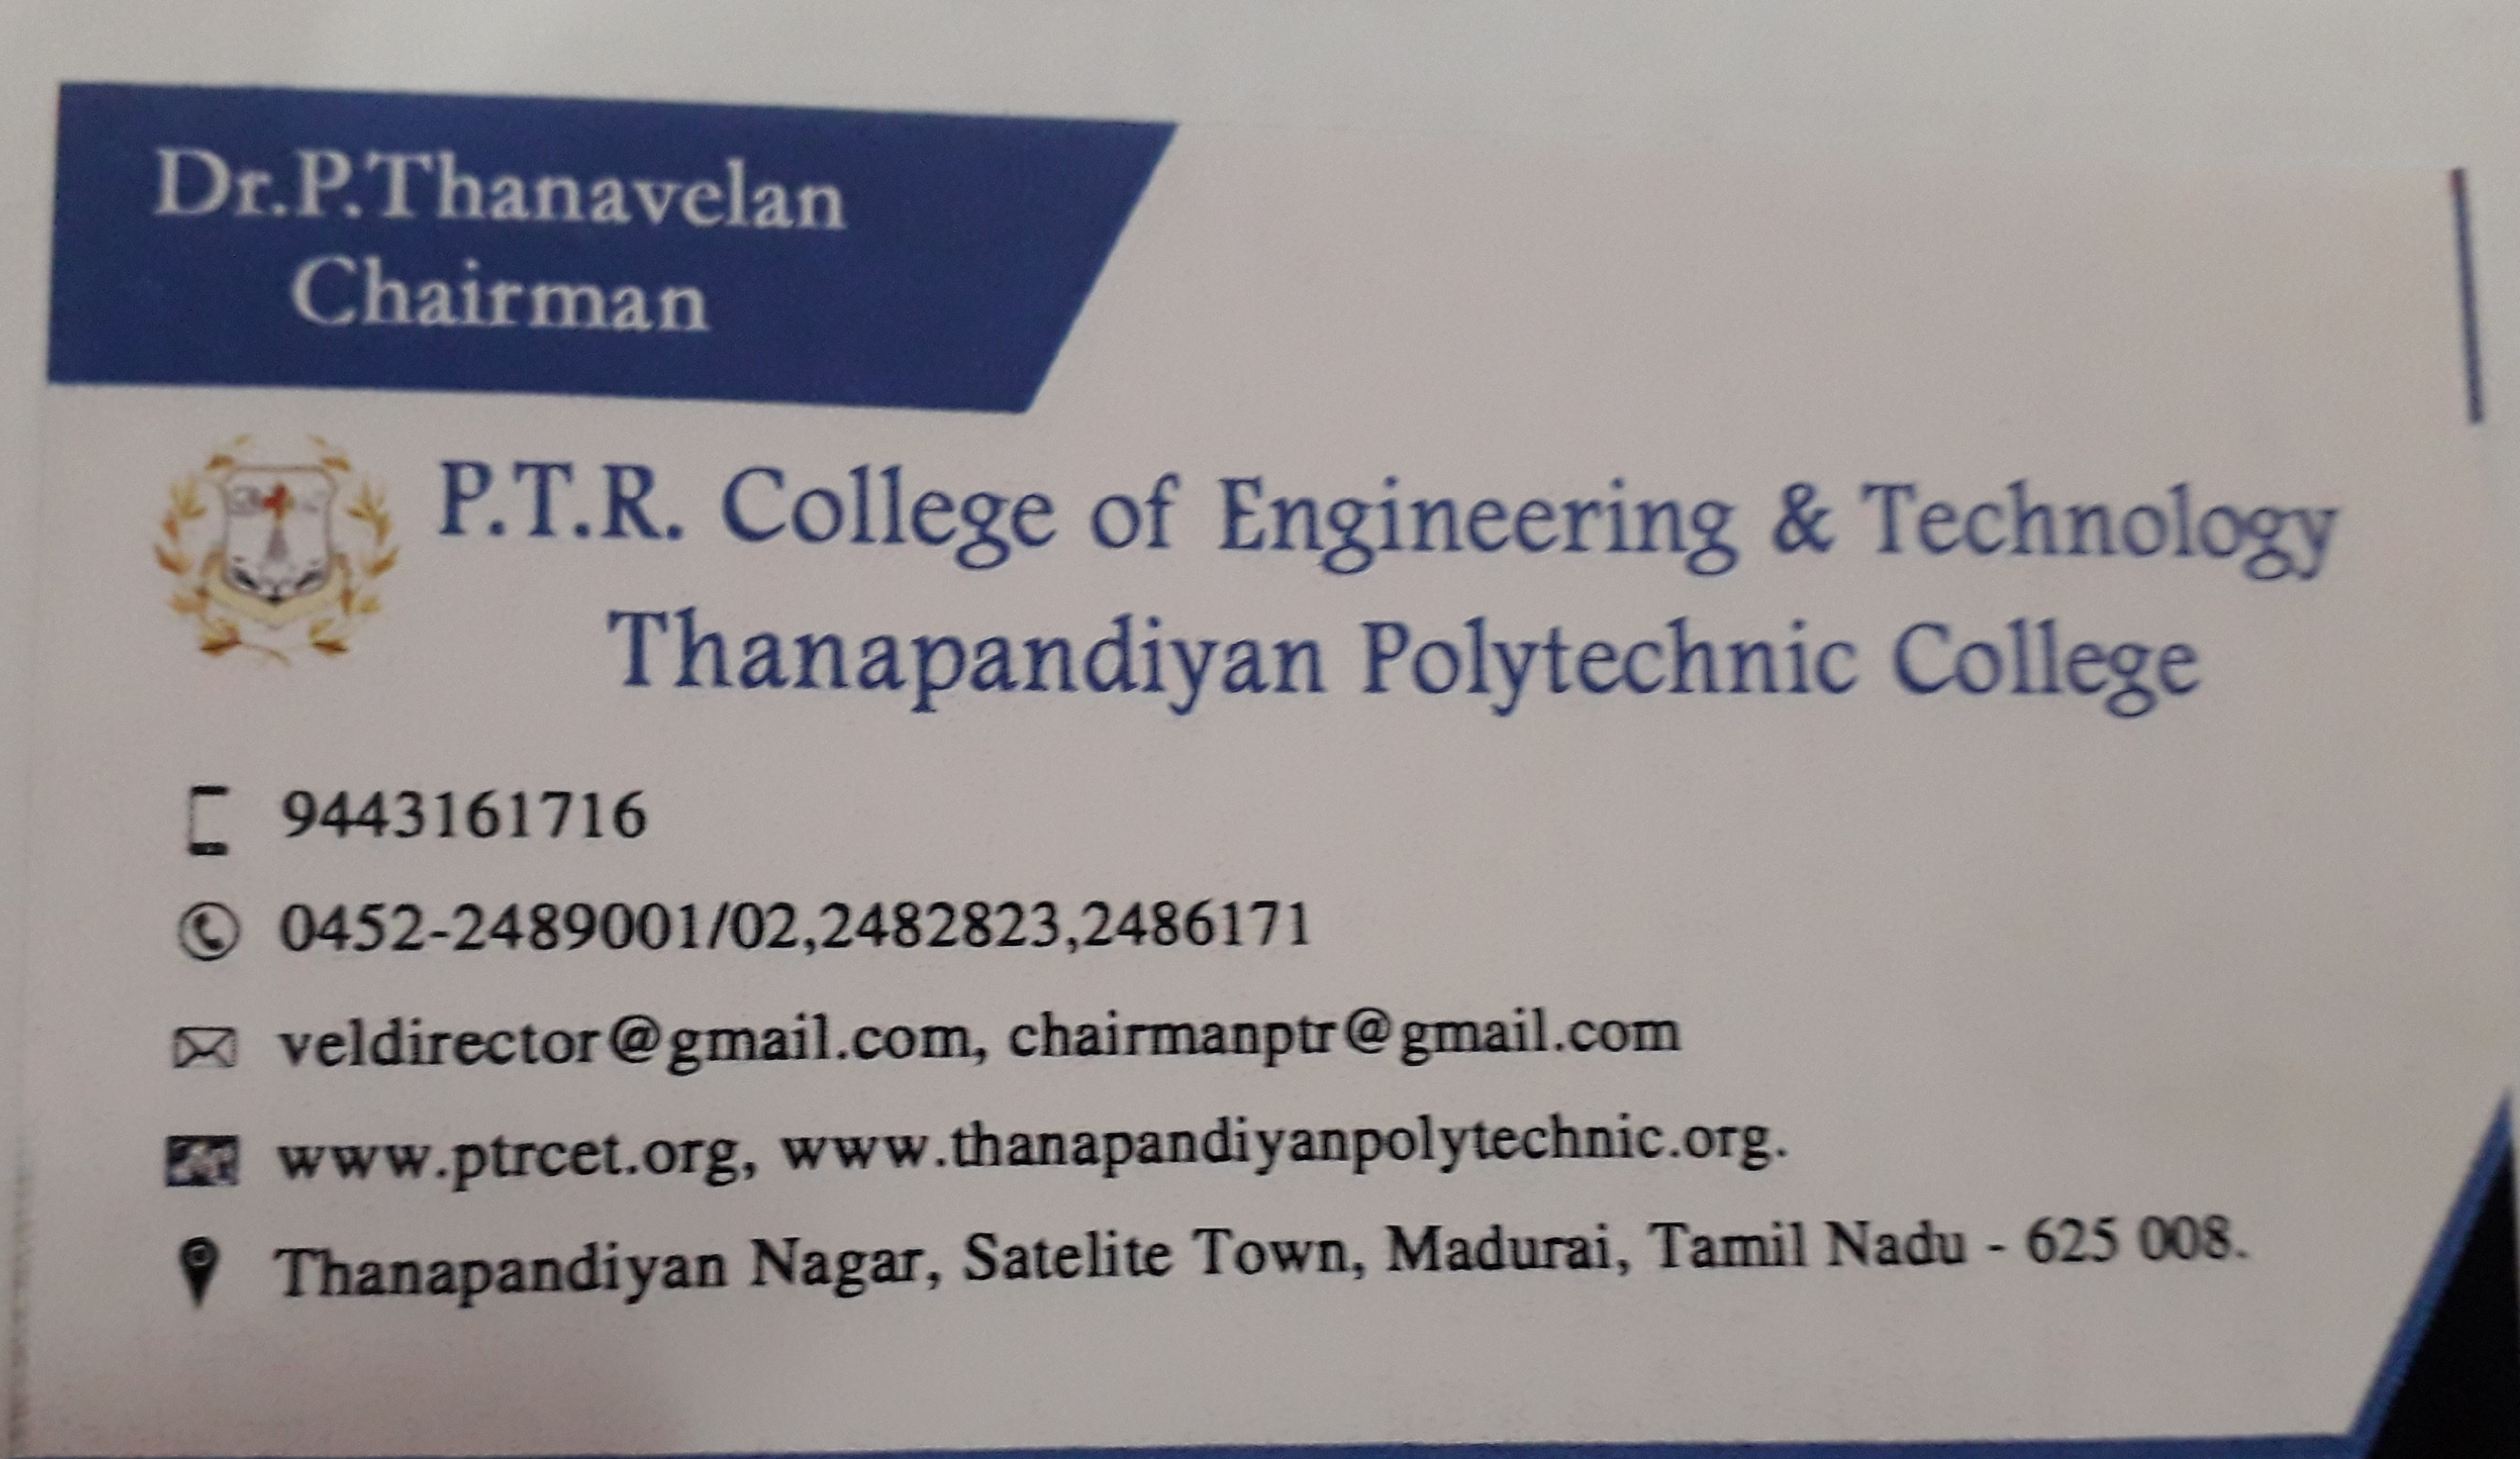 Dr.P DHANAVELAN